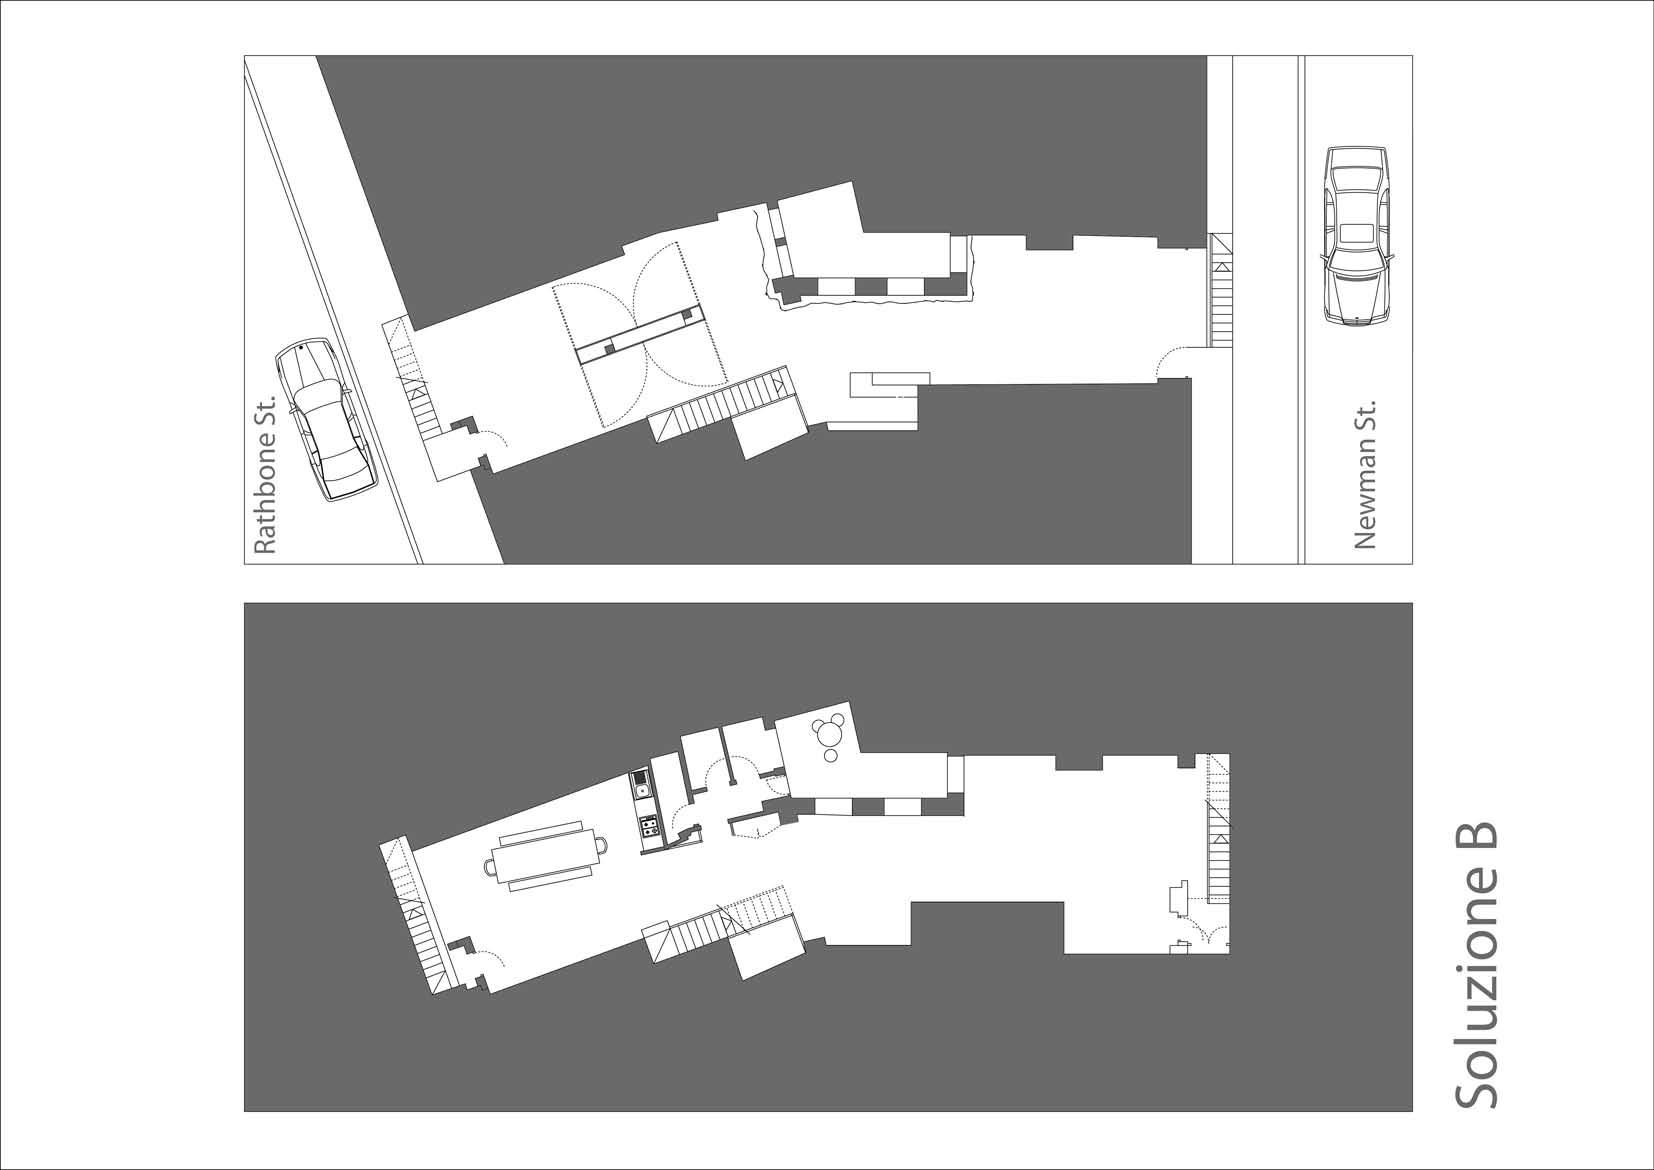 progetto londra1_Pagina_12.jpg